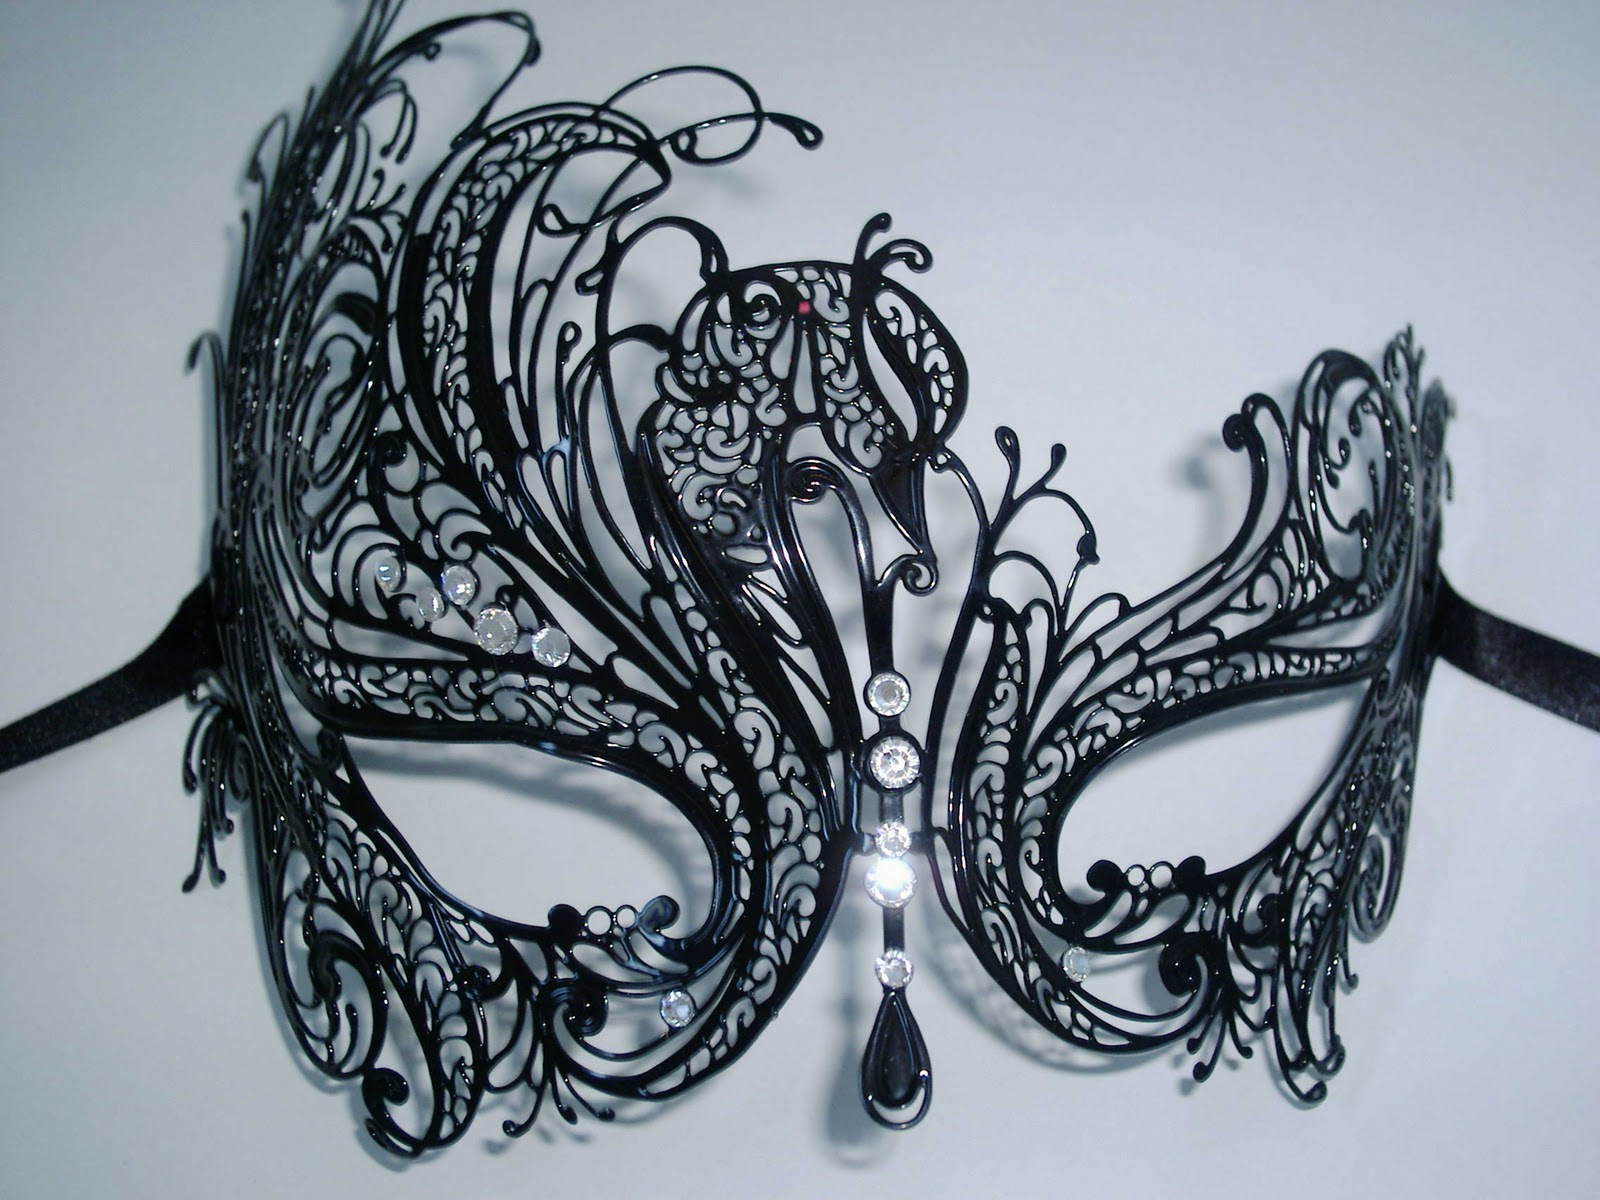 1600x1200 Mireille Venetian Masquerade Mask